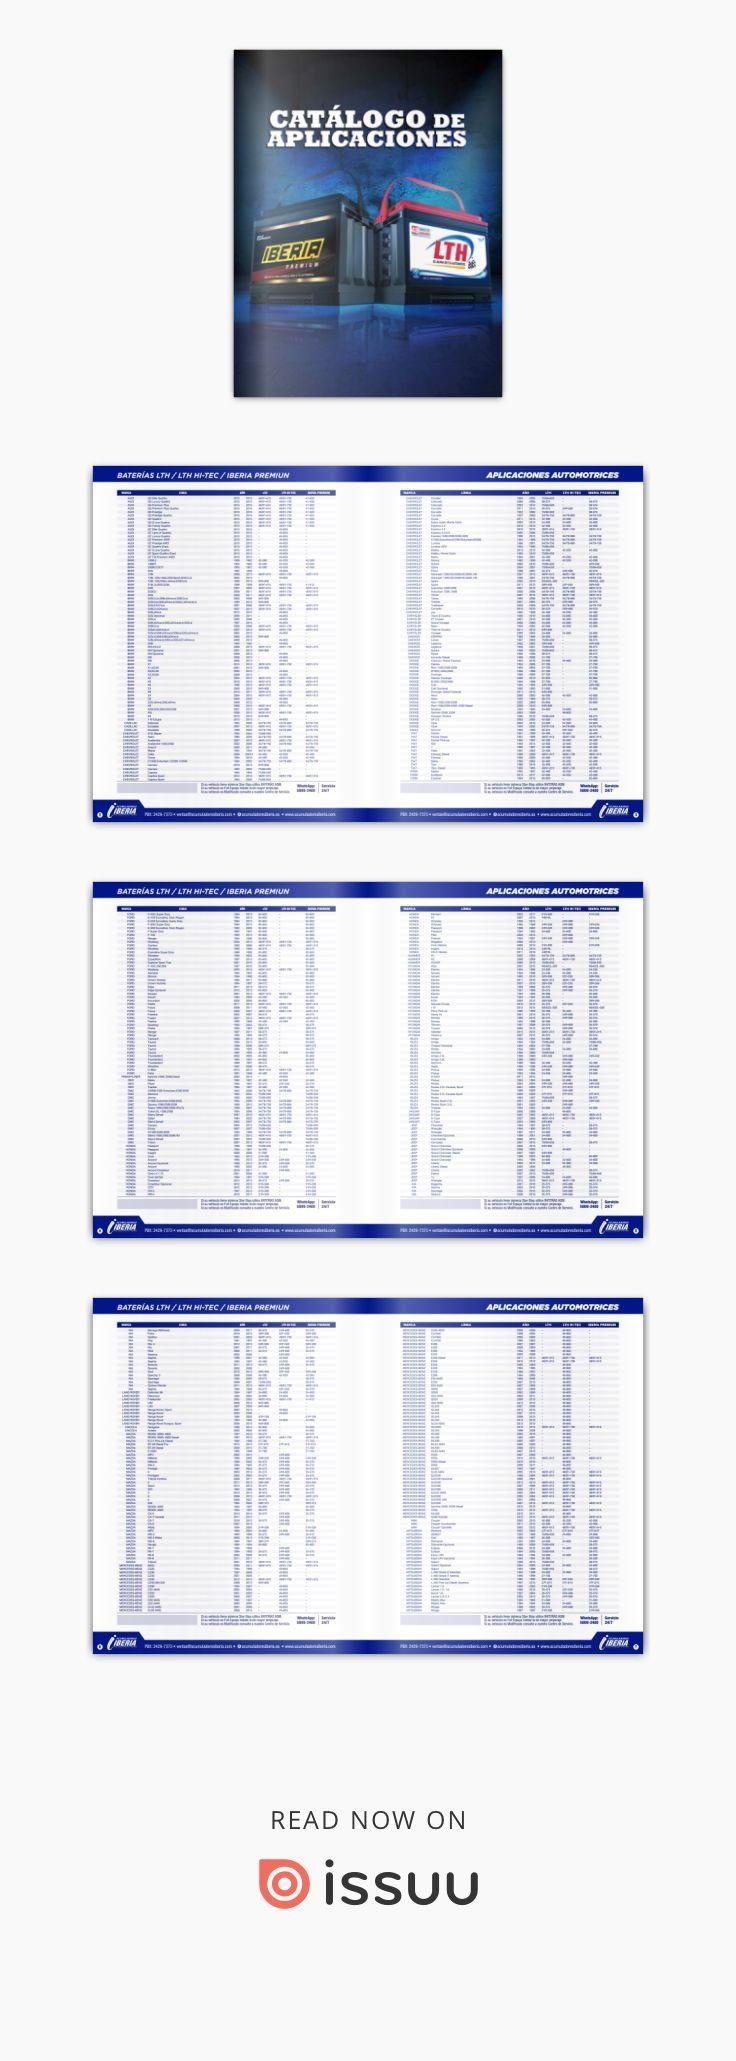 Catalogo De Aplicaciones Catalogo Grand Caravan Baterias Lth